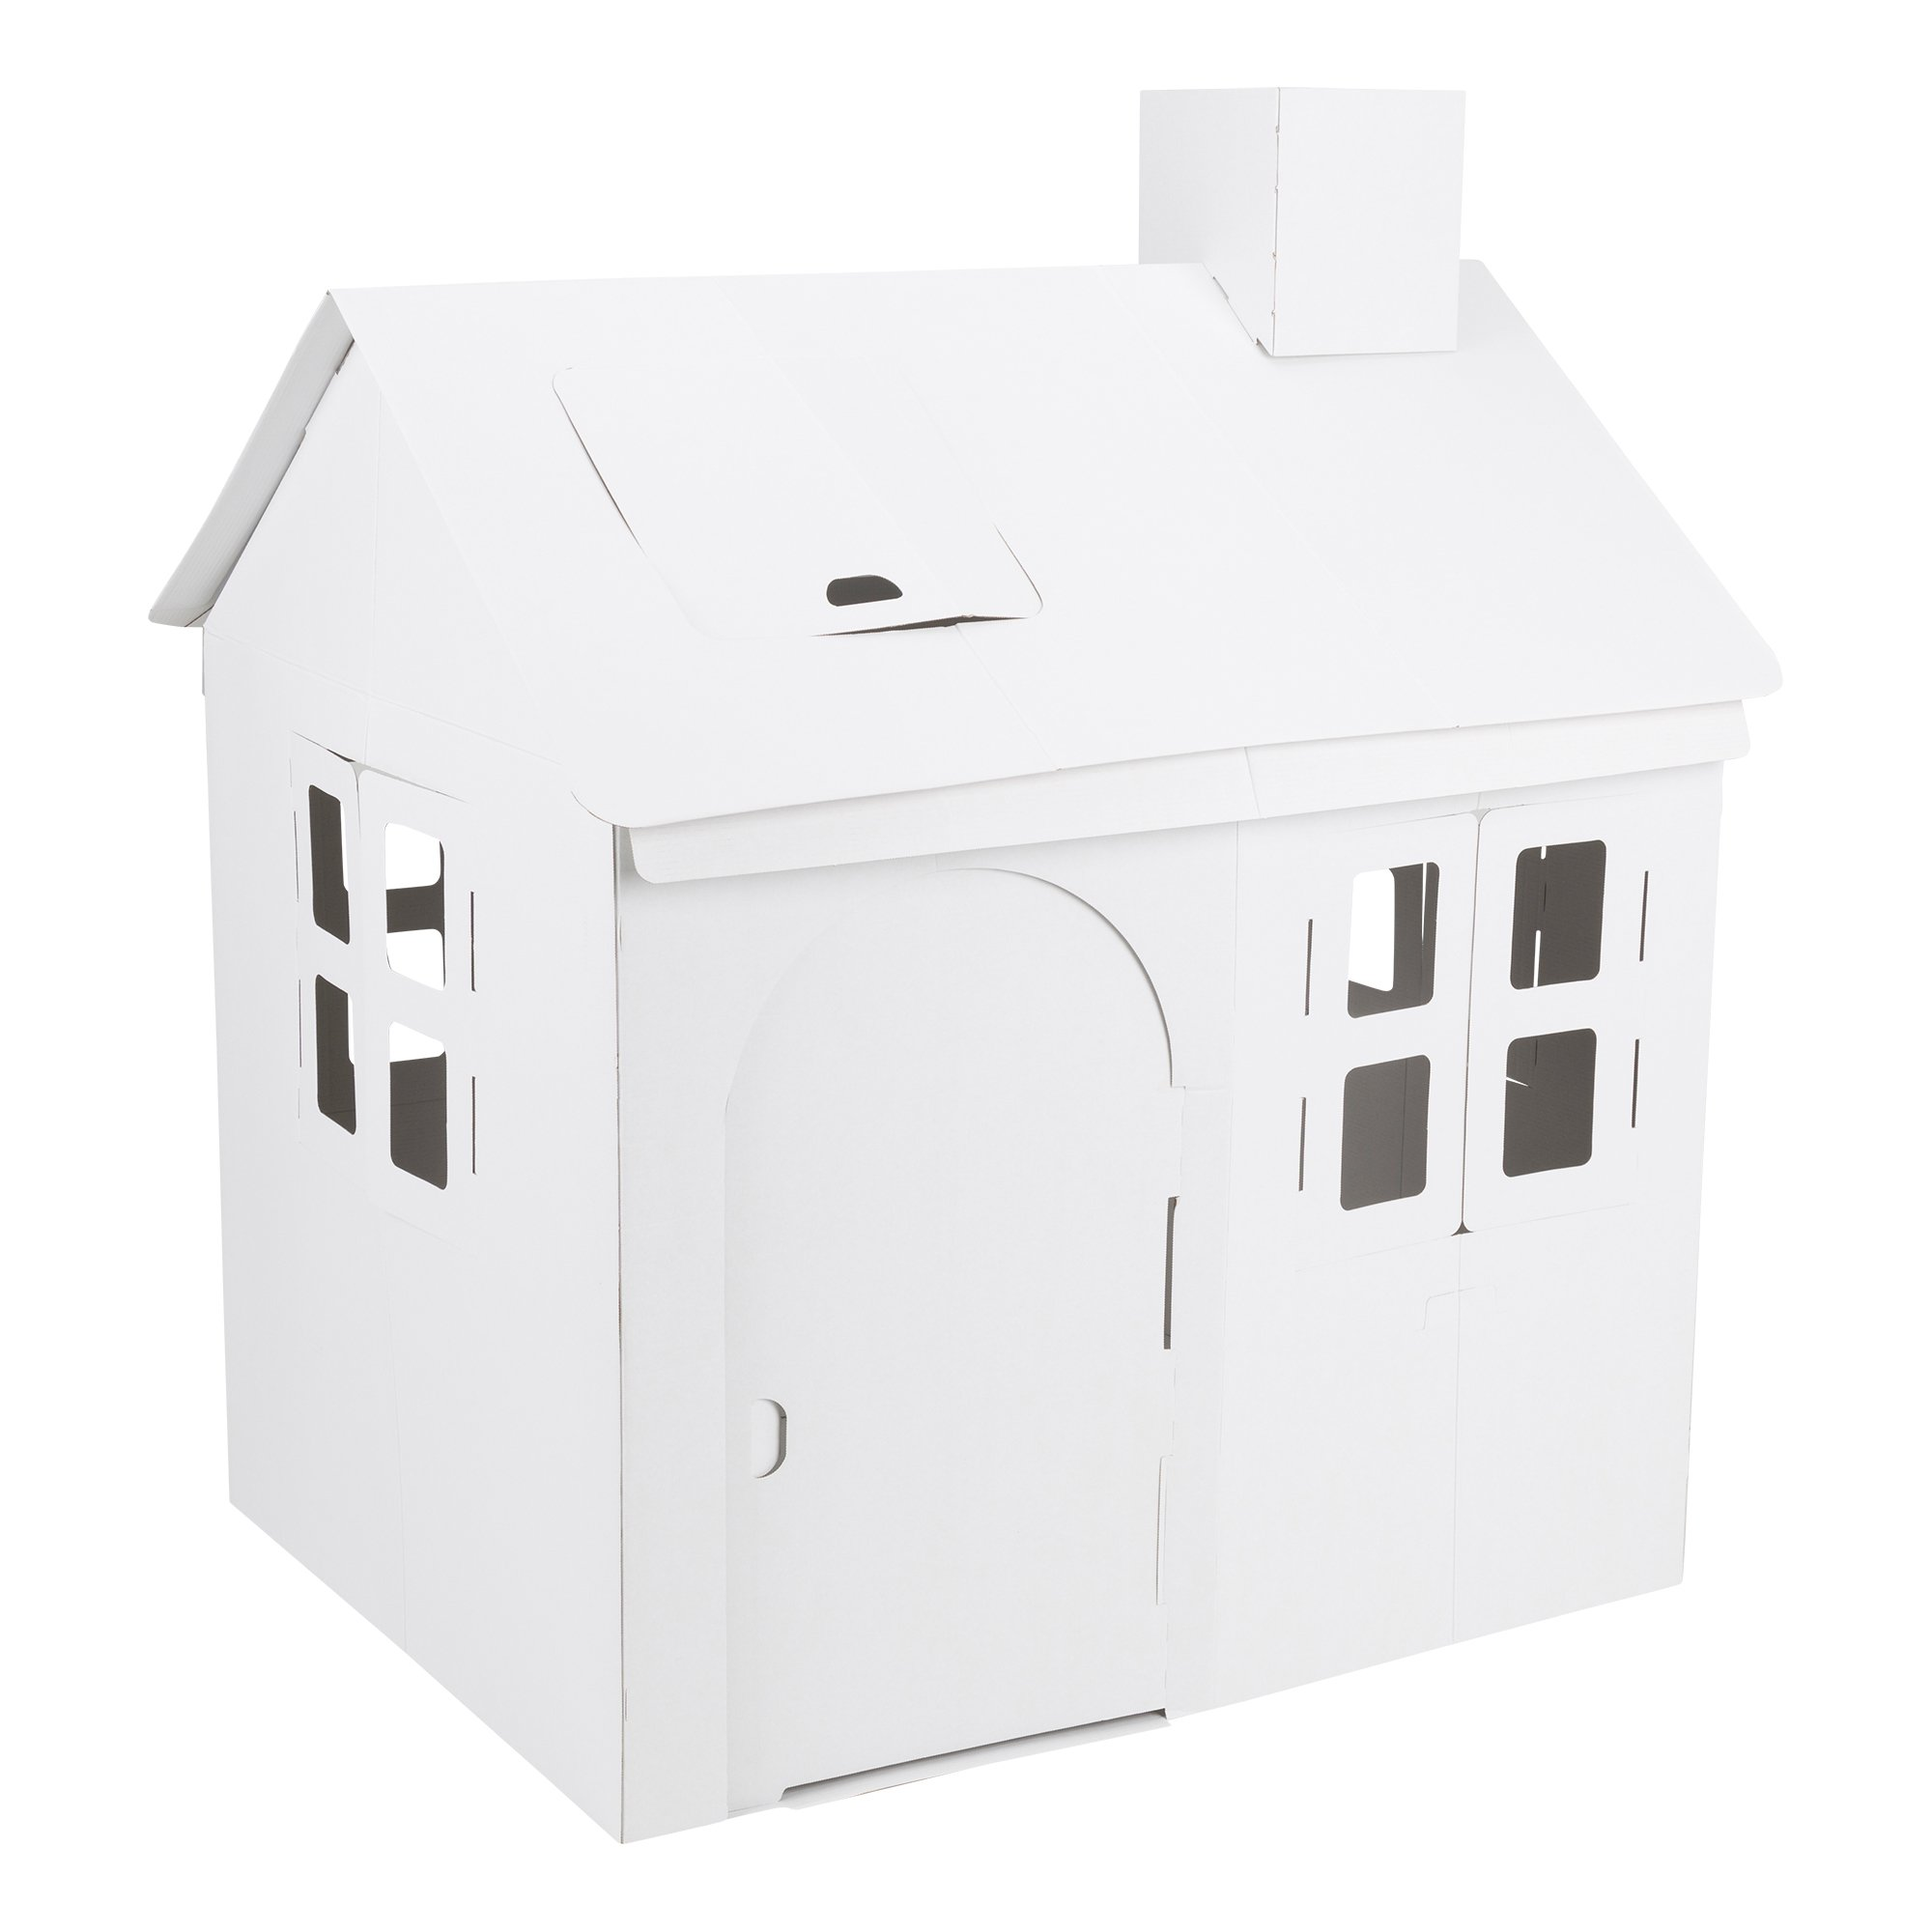 Fat Catalog ALT-ERU1007-SO Cardboard Coloring Craft, Kid-Sized Playhouse, White/Black